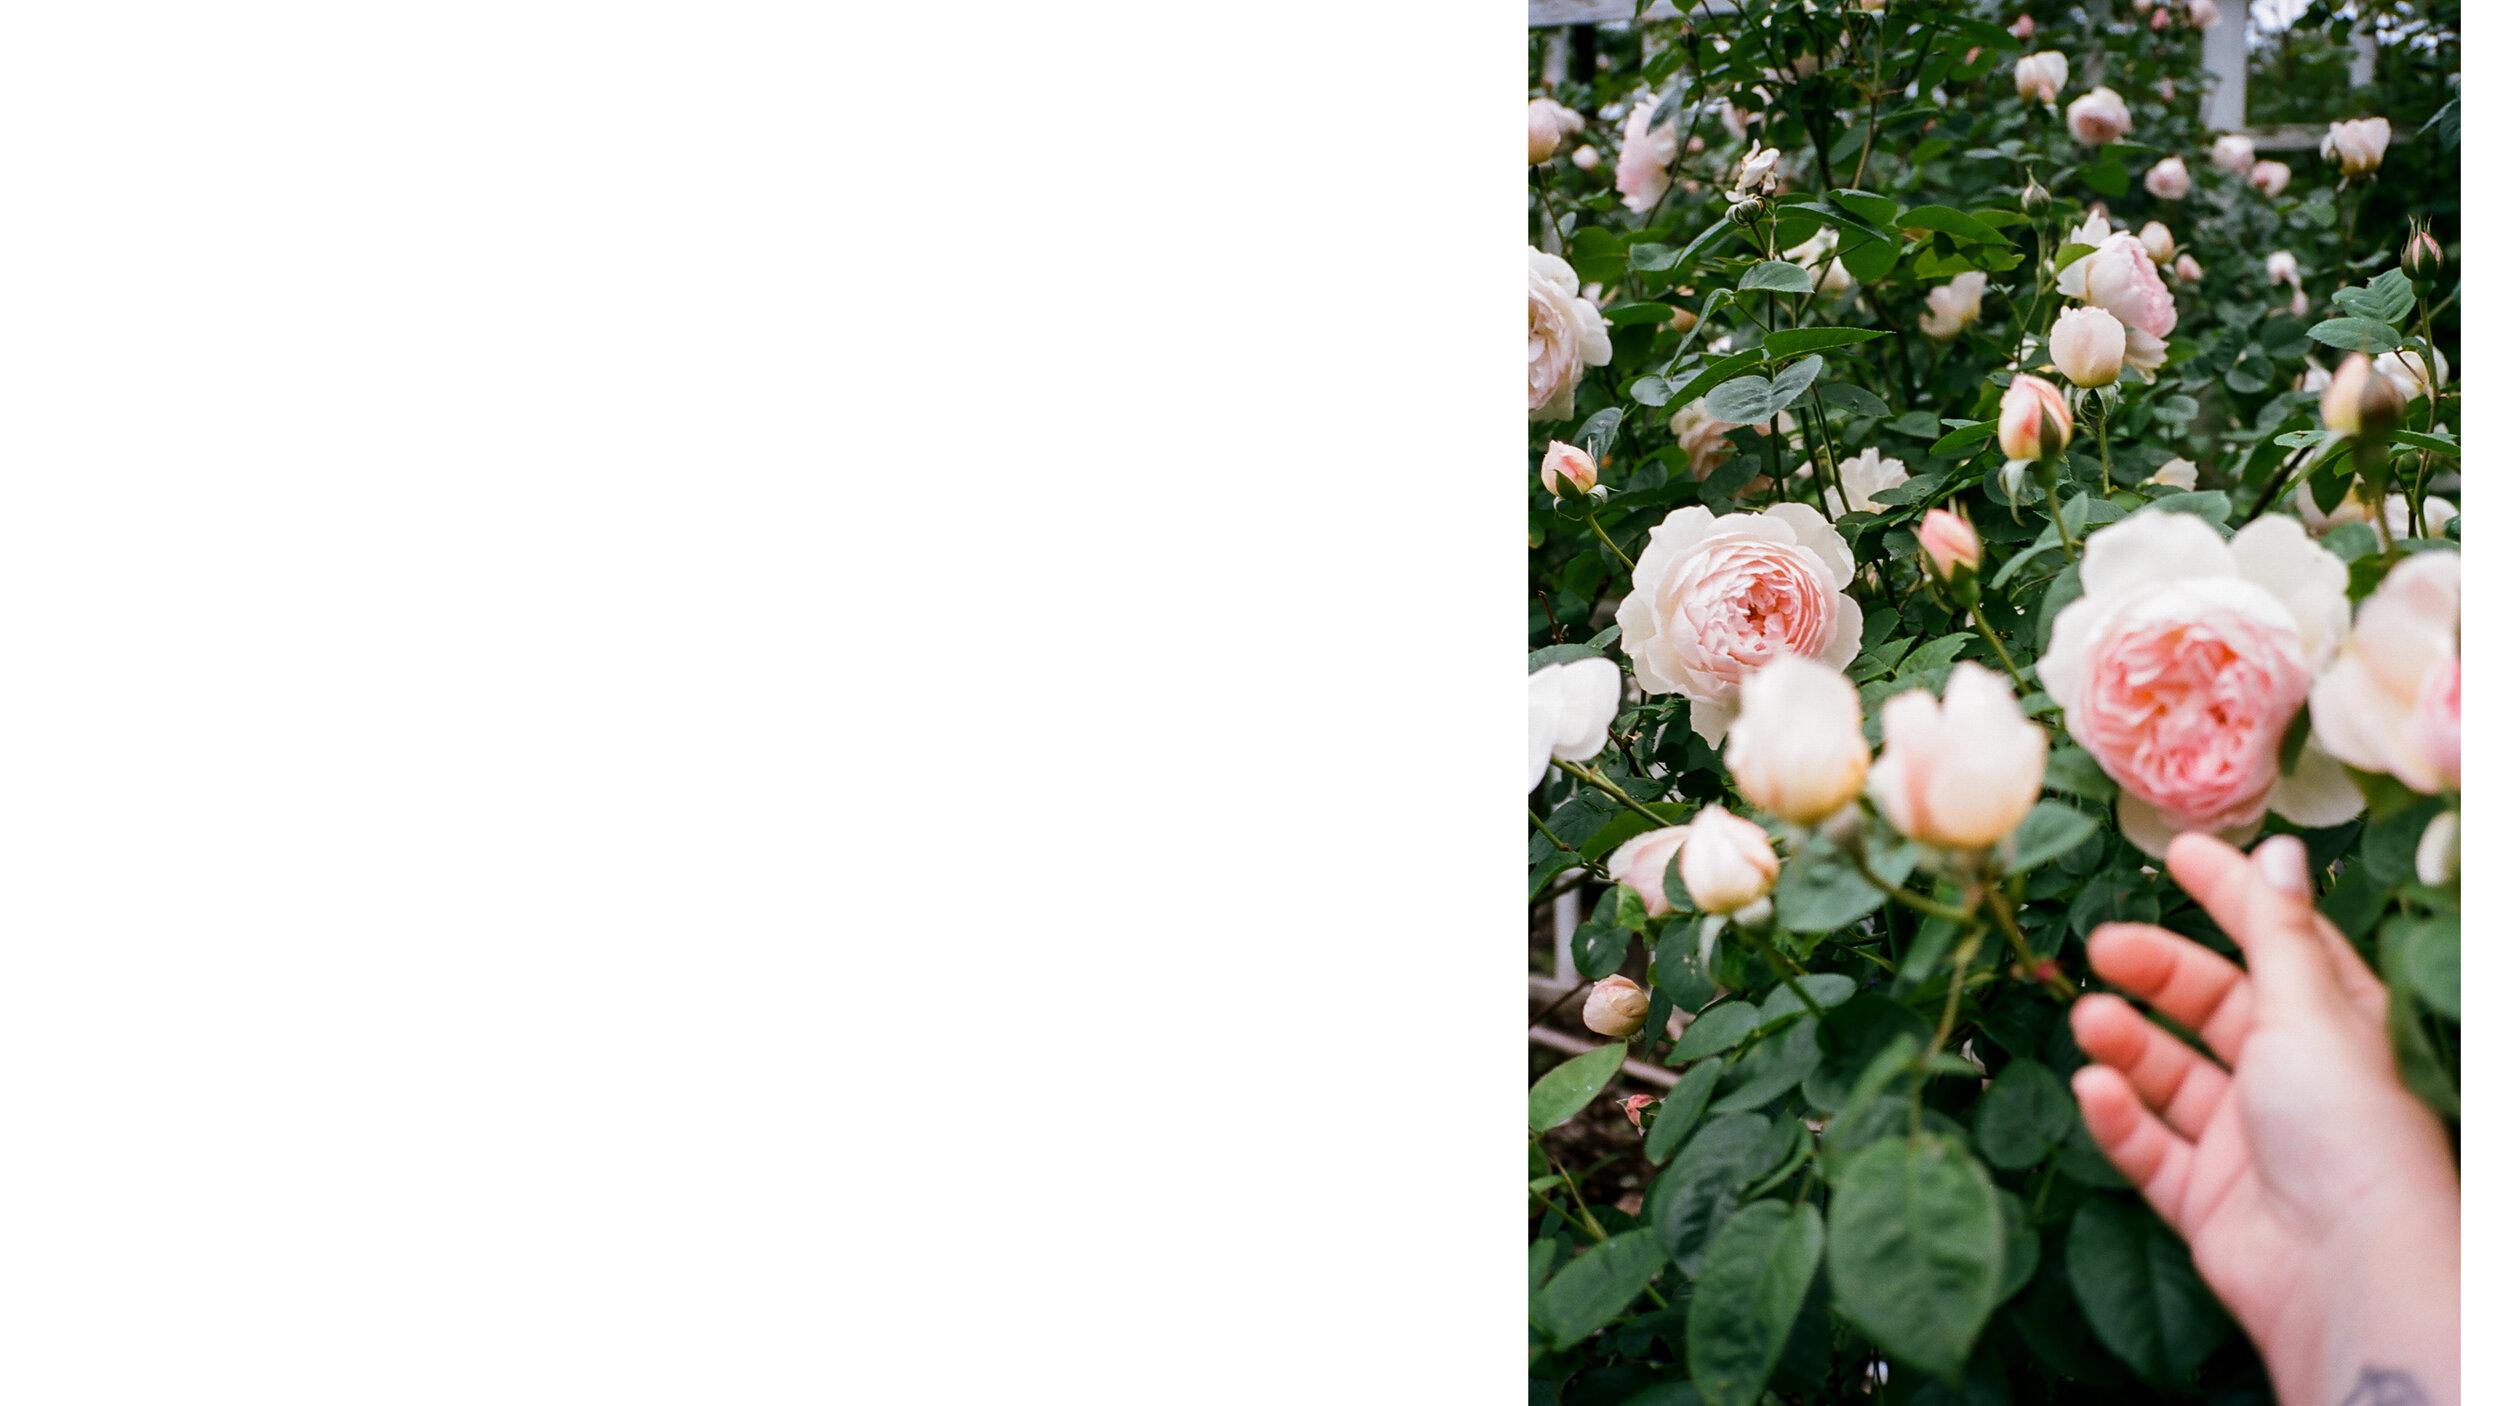 pics-2-2.jpg